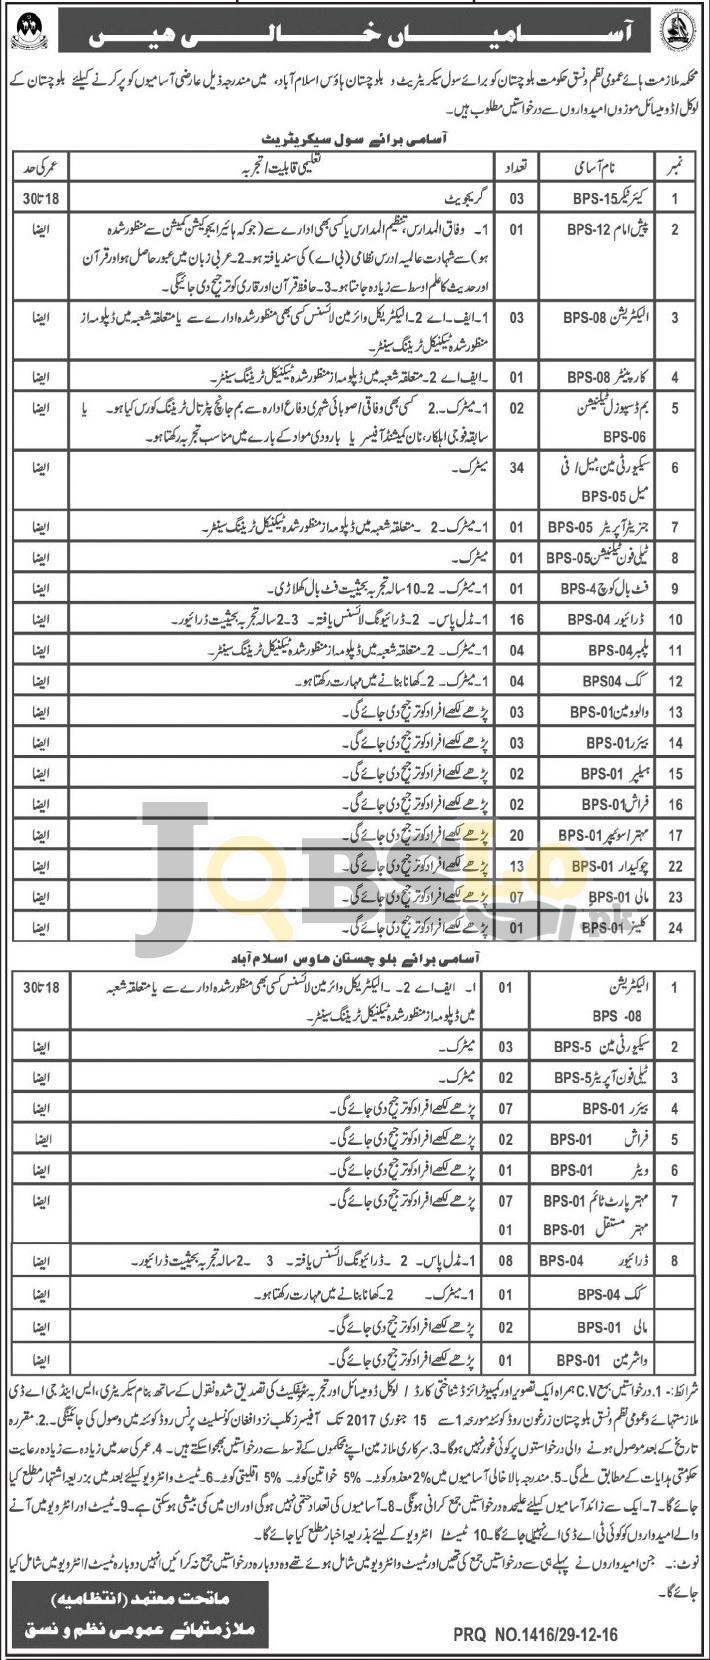 Balochistan Civil Secretariat Jobs